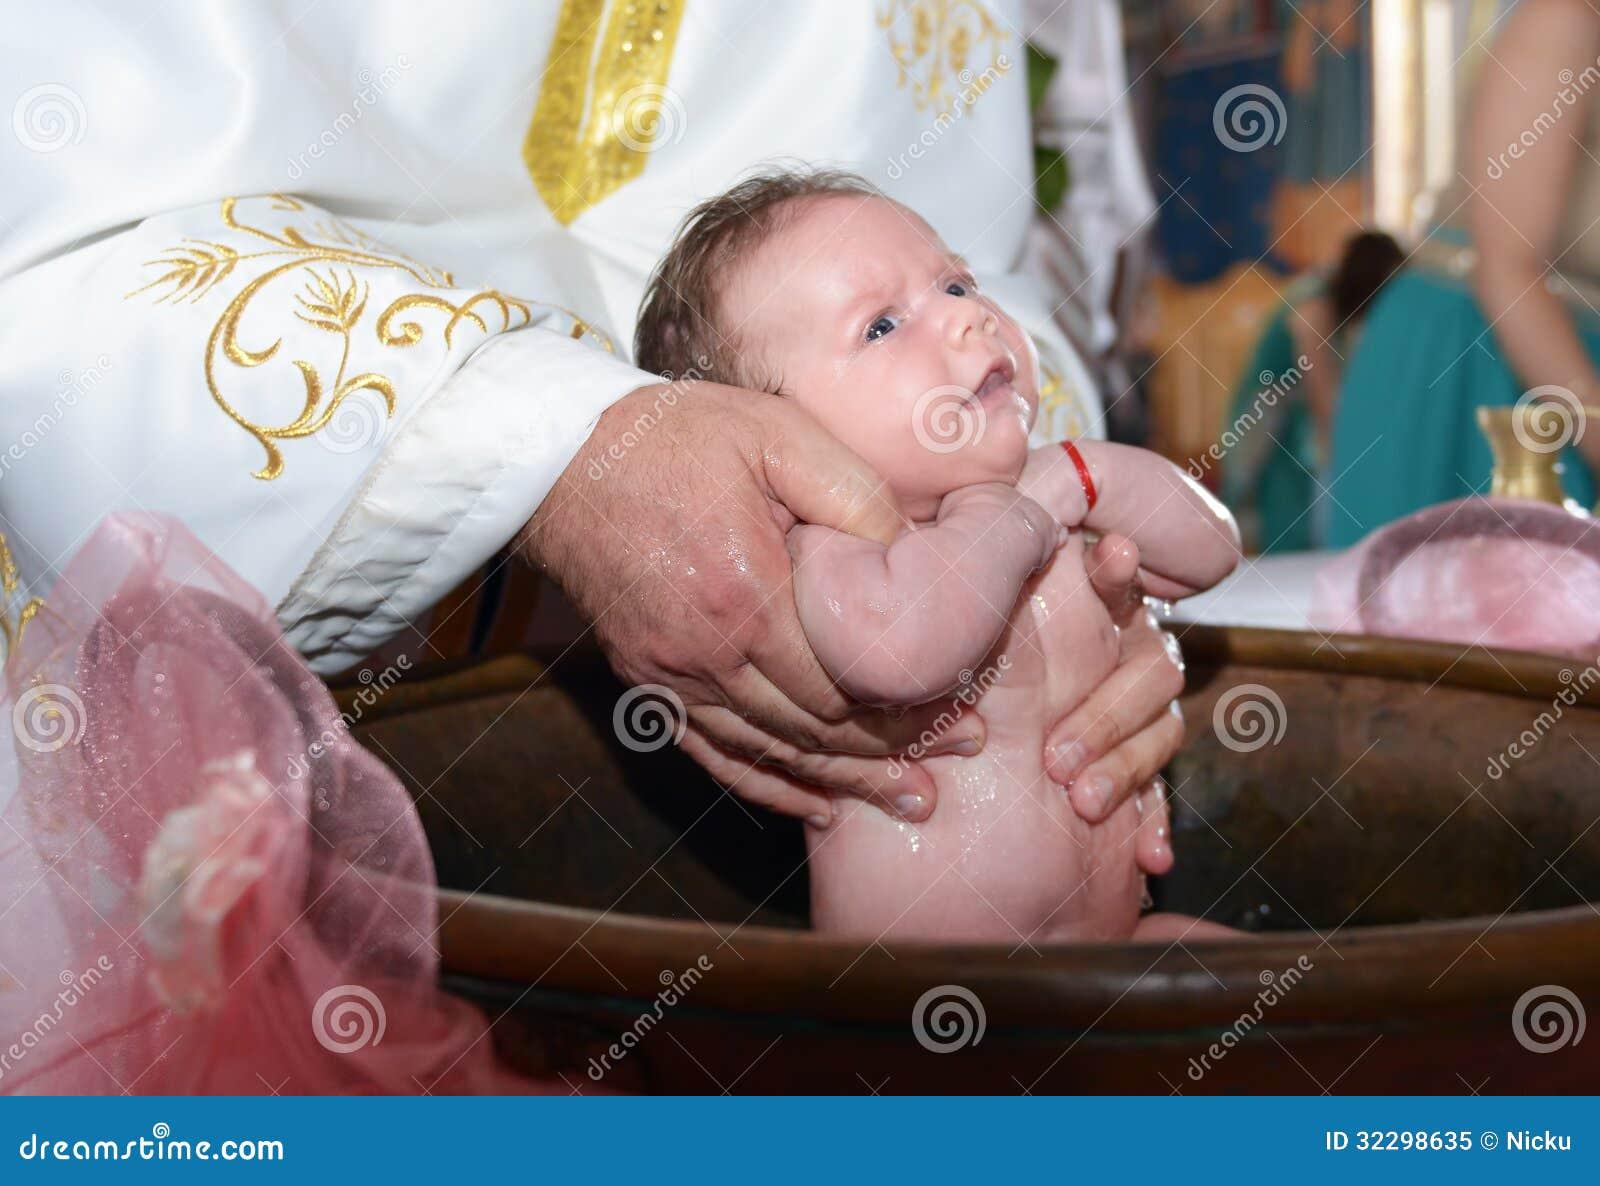 christian baptism - photo #25